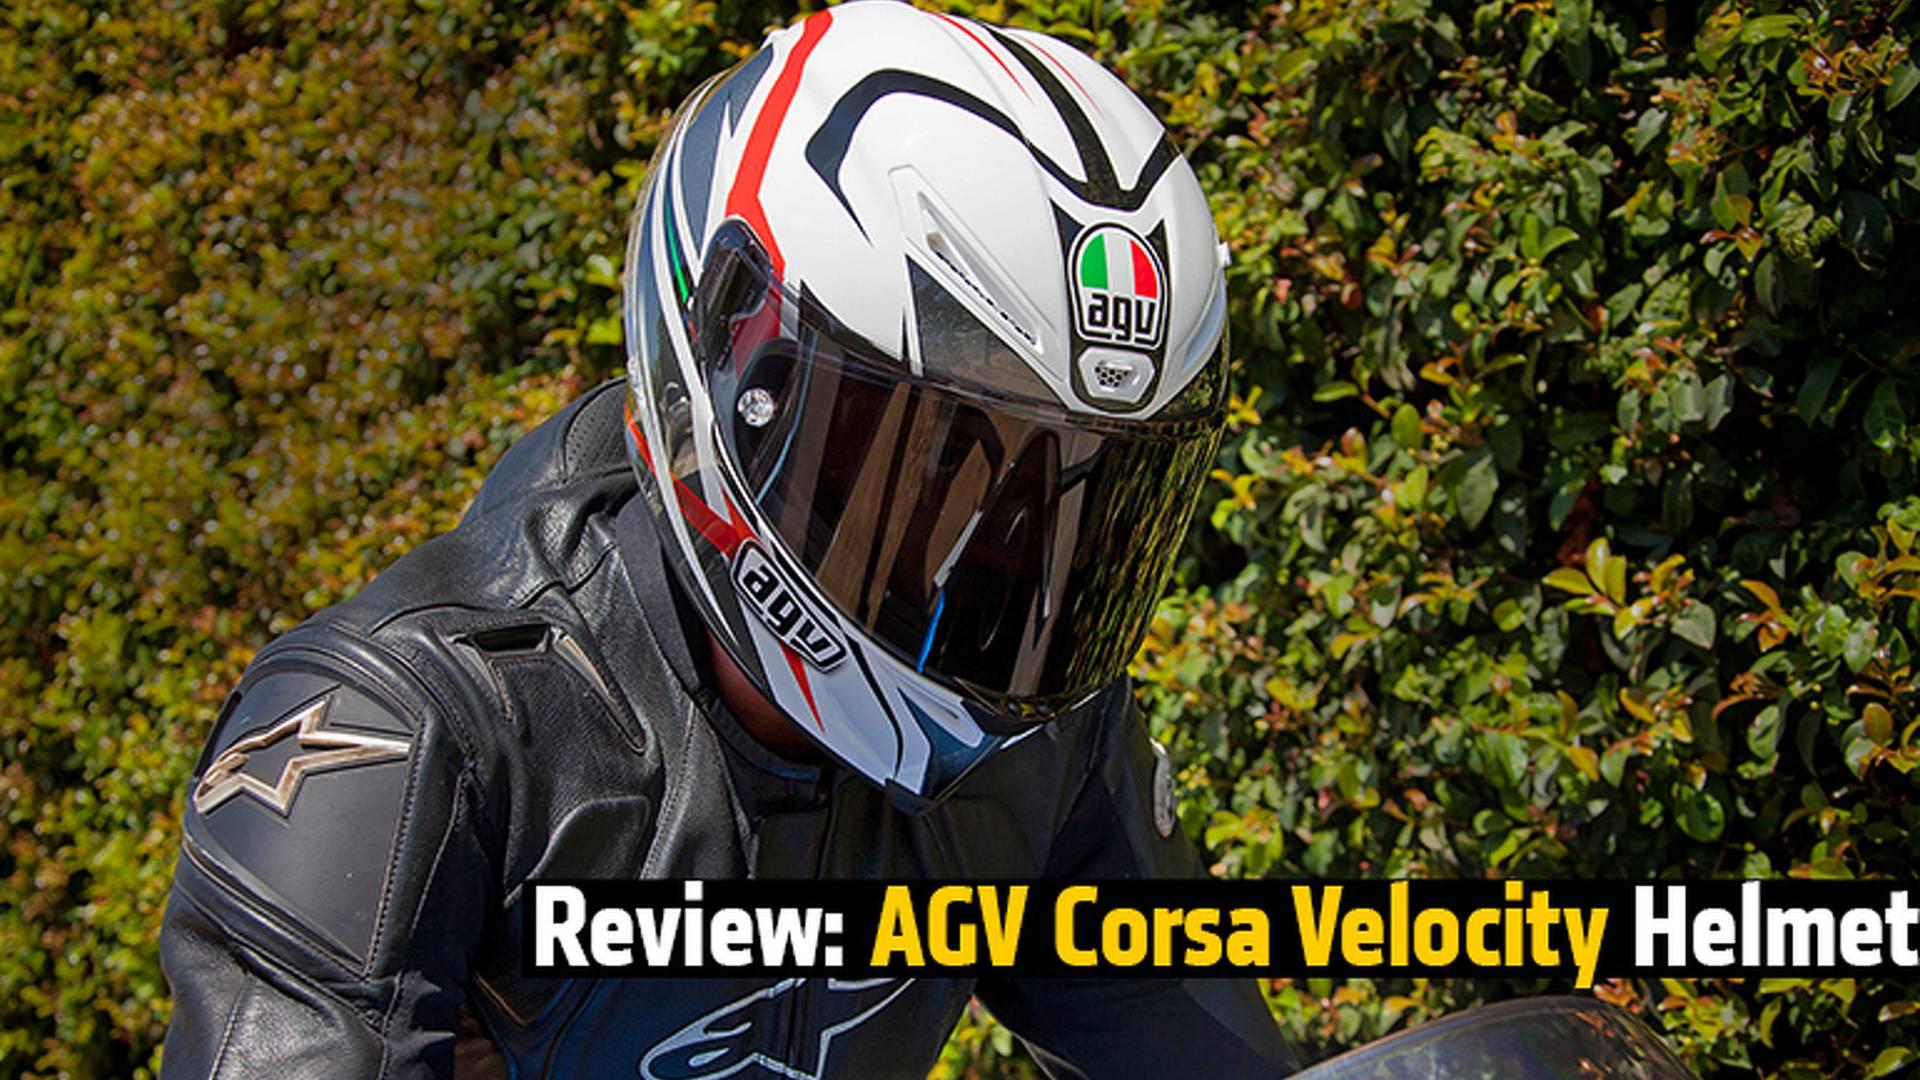 Agv Motorcycle Helmets Amazon Source Helmet Wallpaper Hd Best